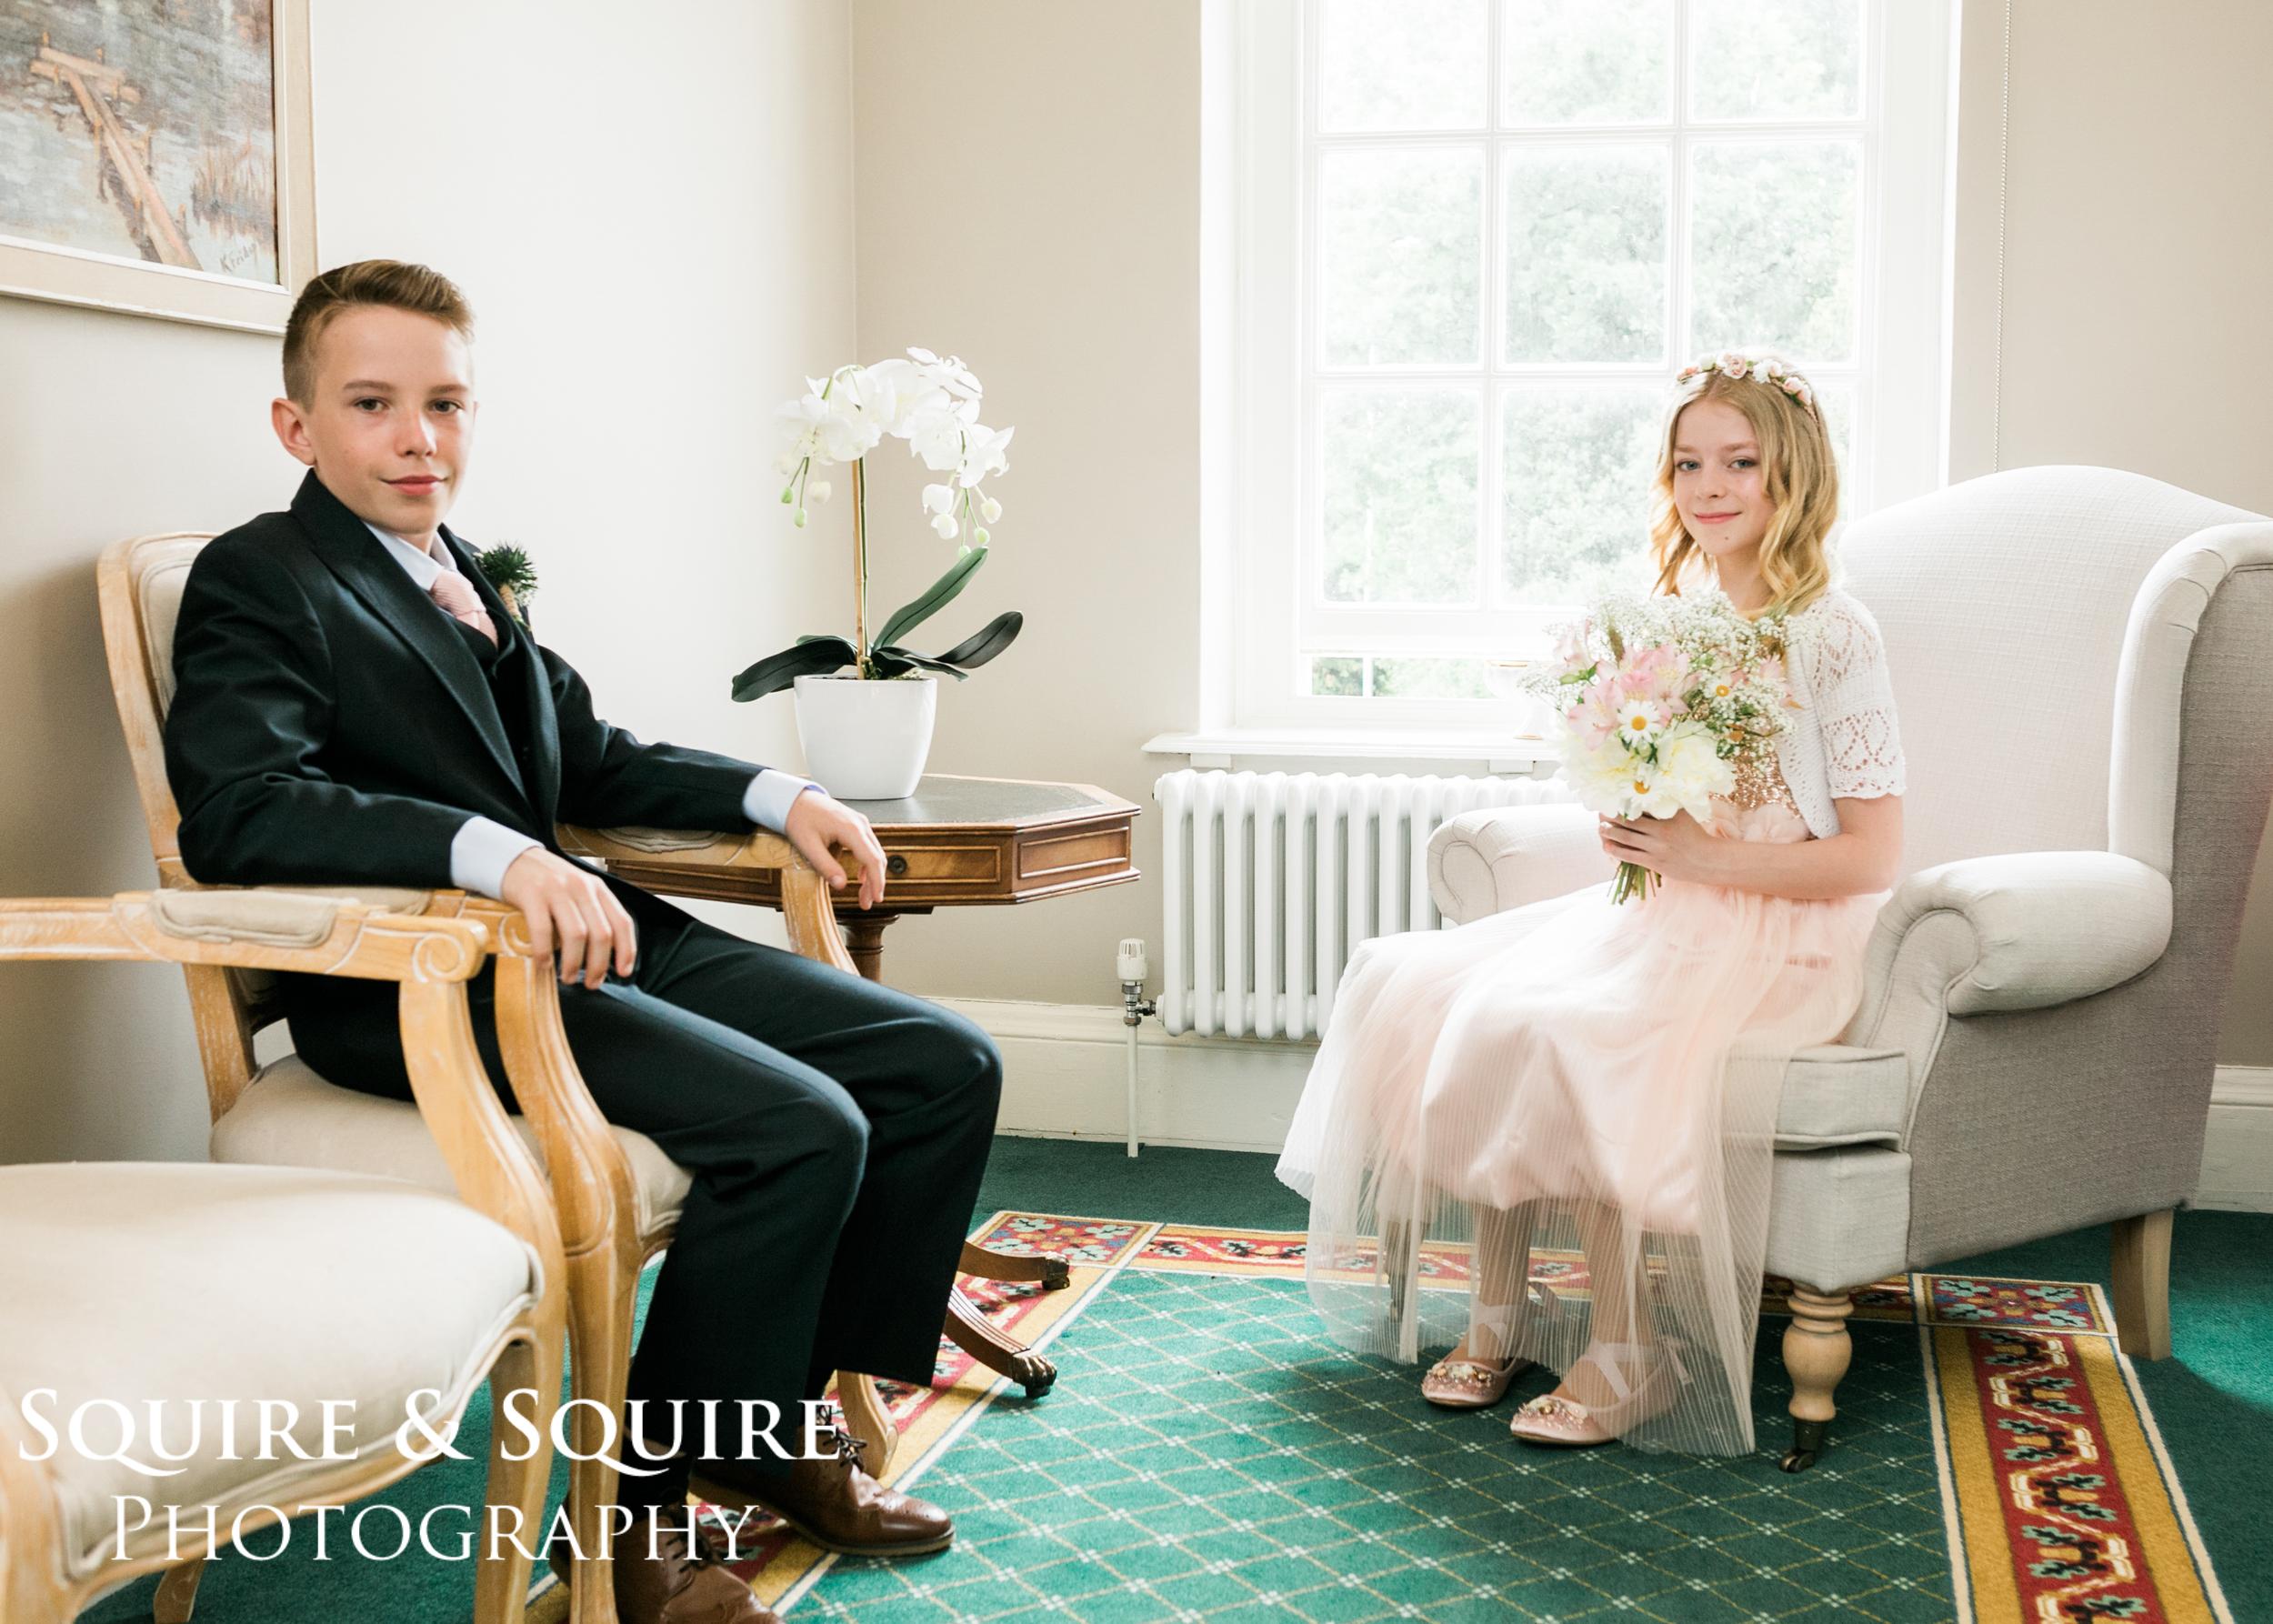 wedding_photography_catthorpe Manor (19 of 66).jpg